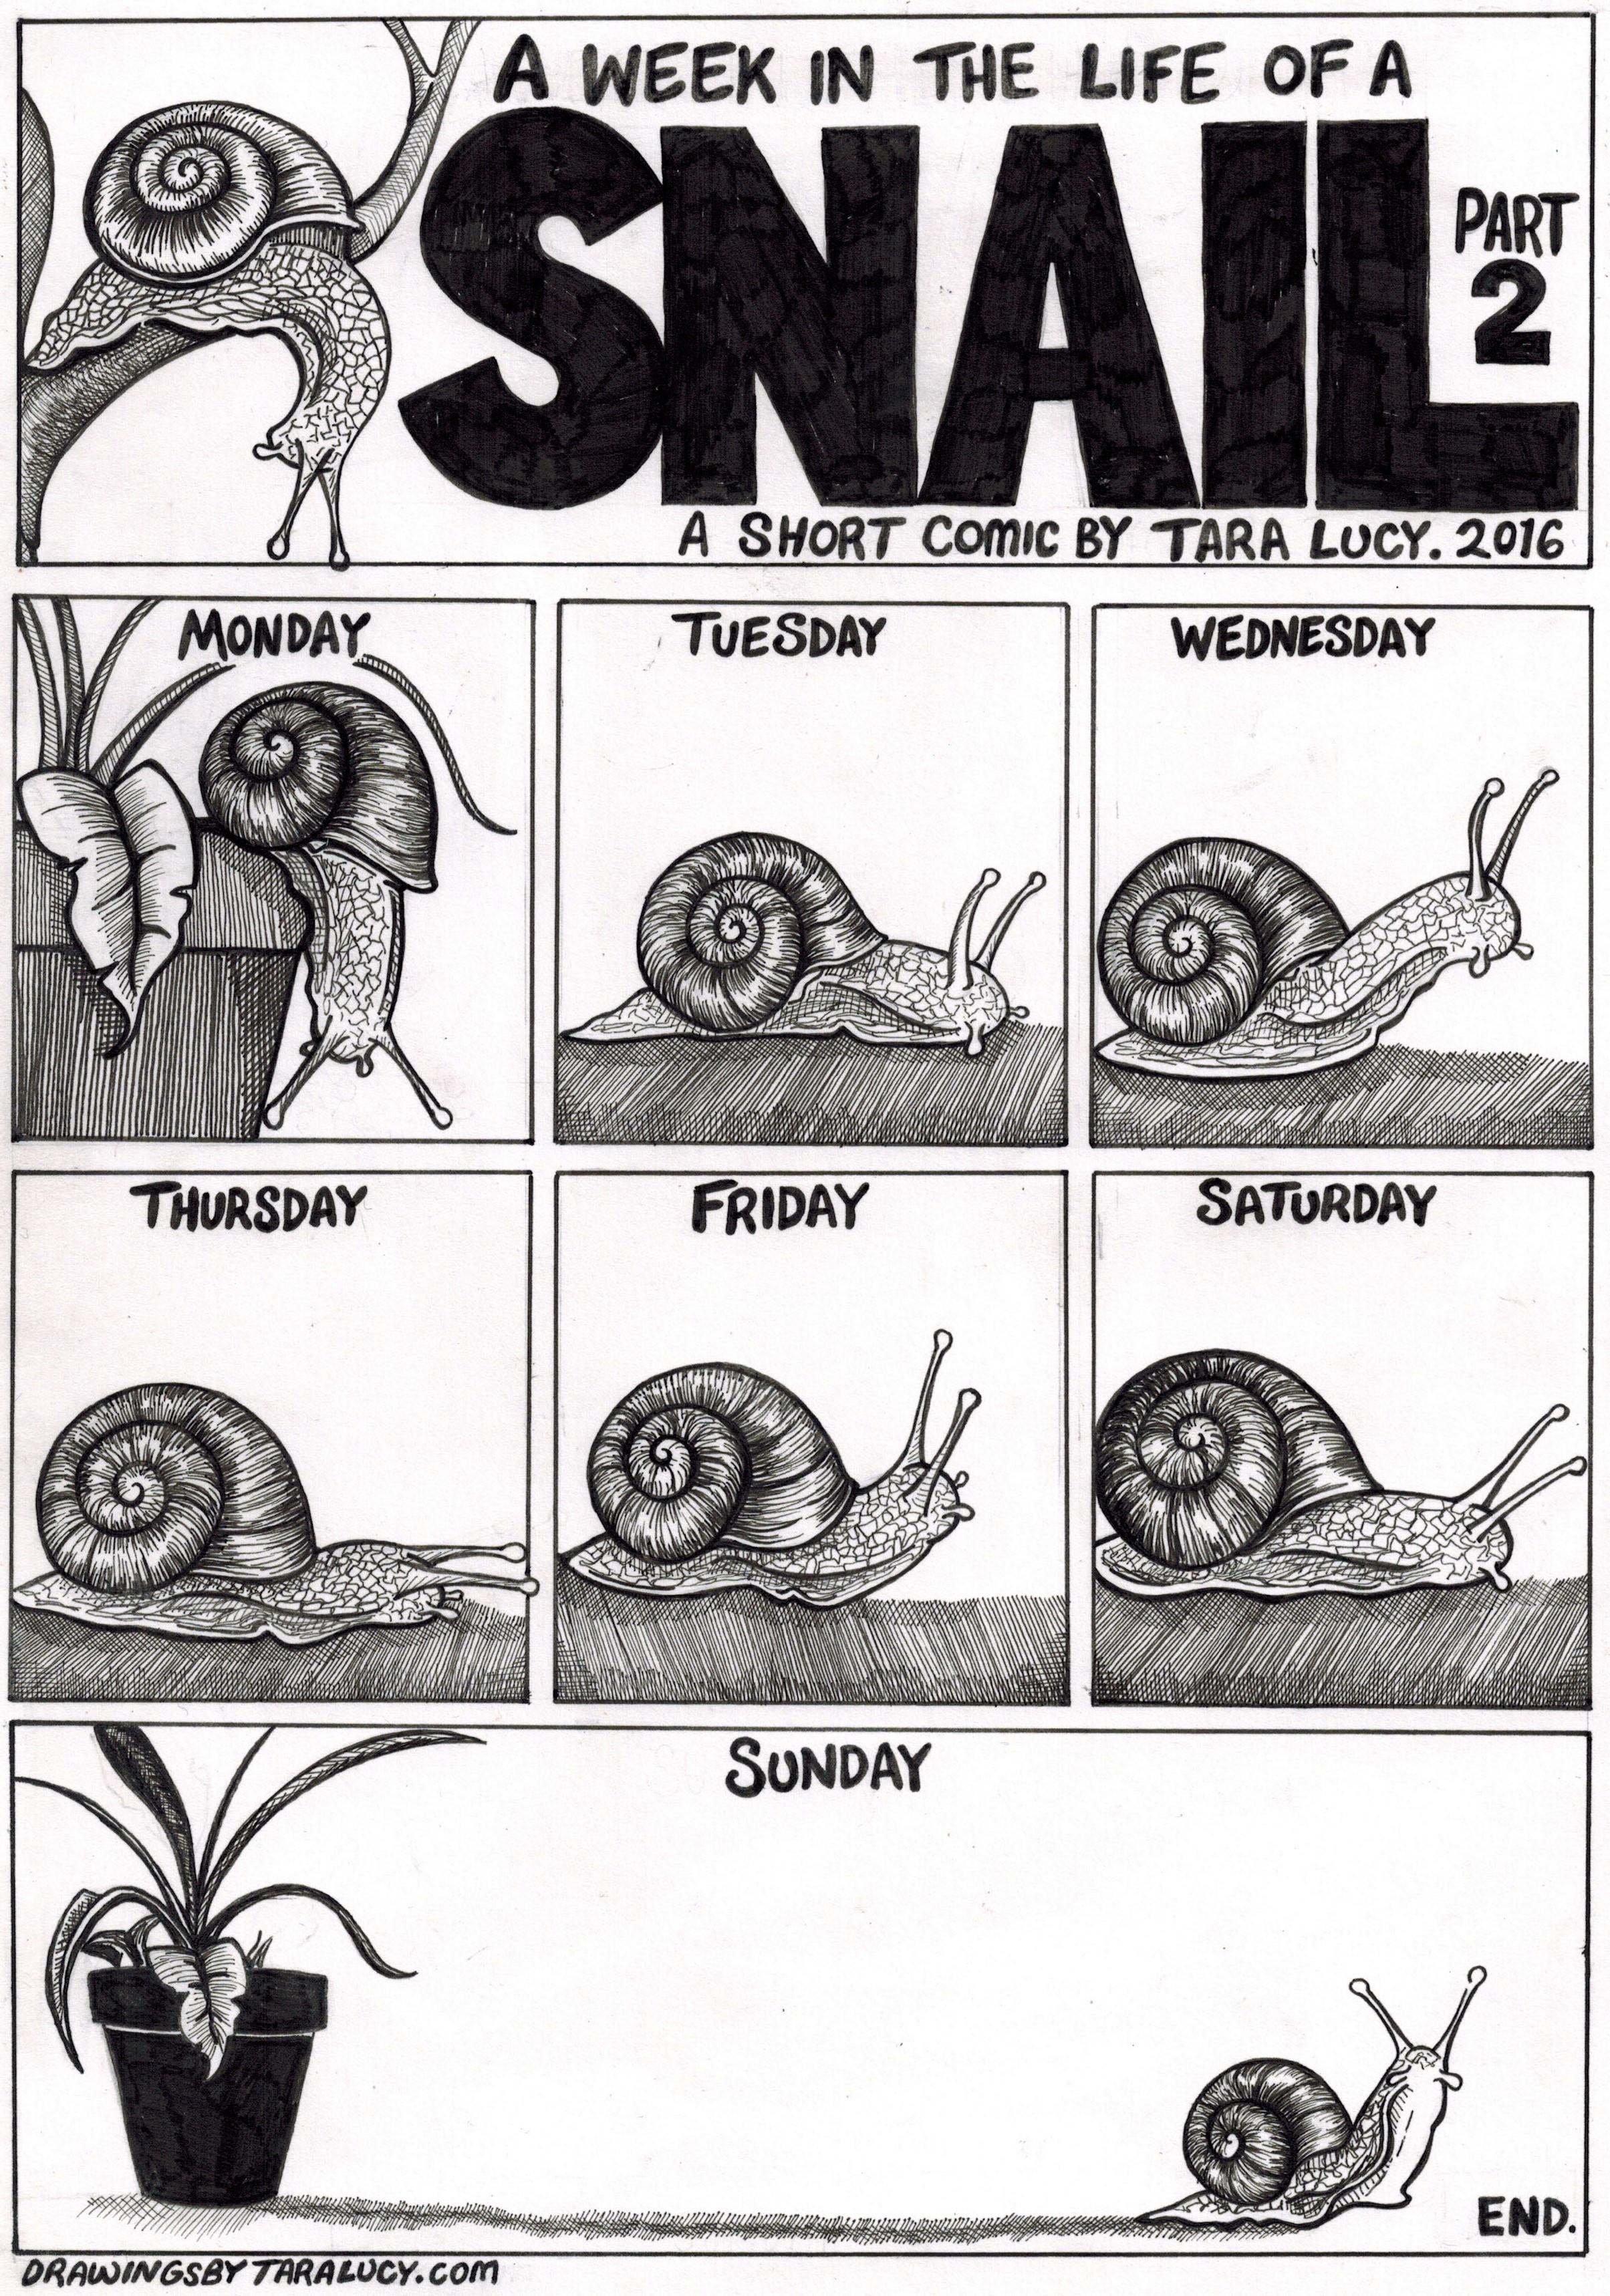 Drawn snail comic DRAWINGS BY TARA ink snail